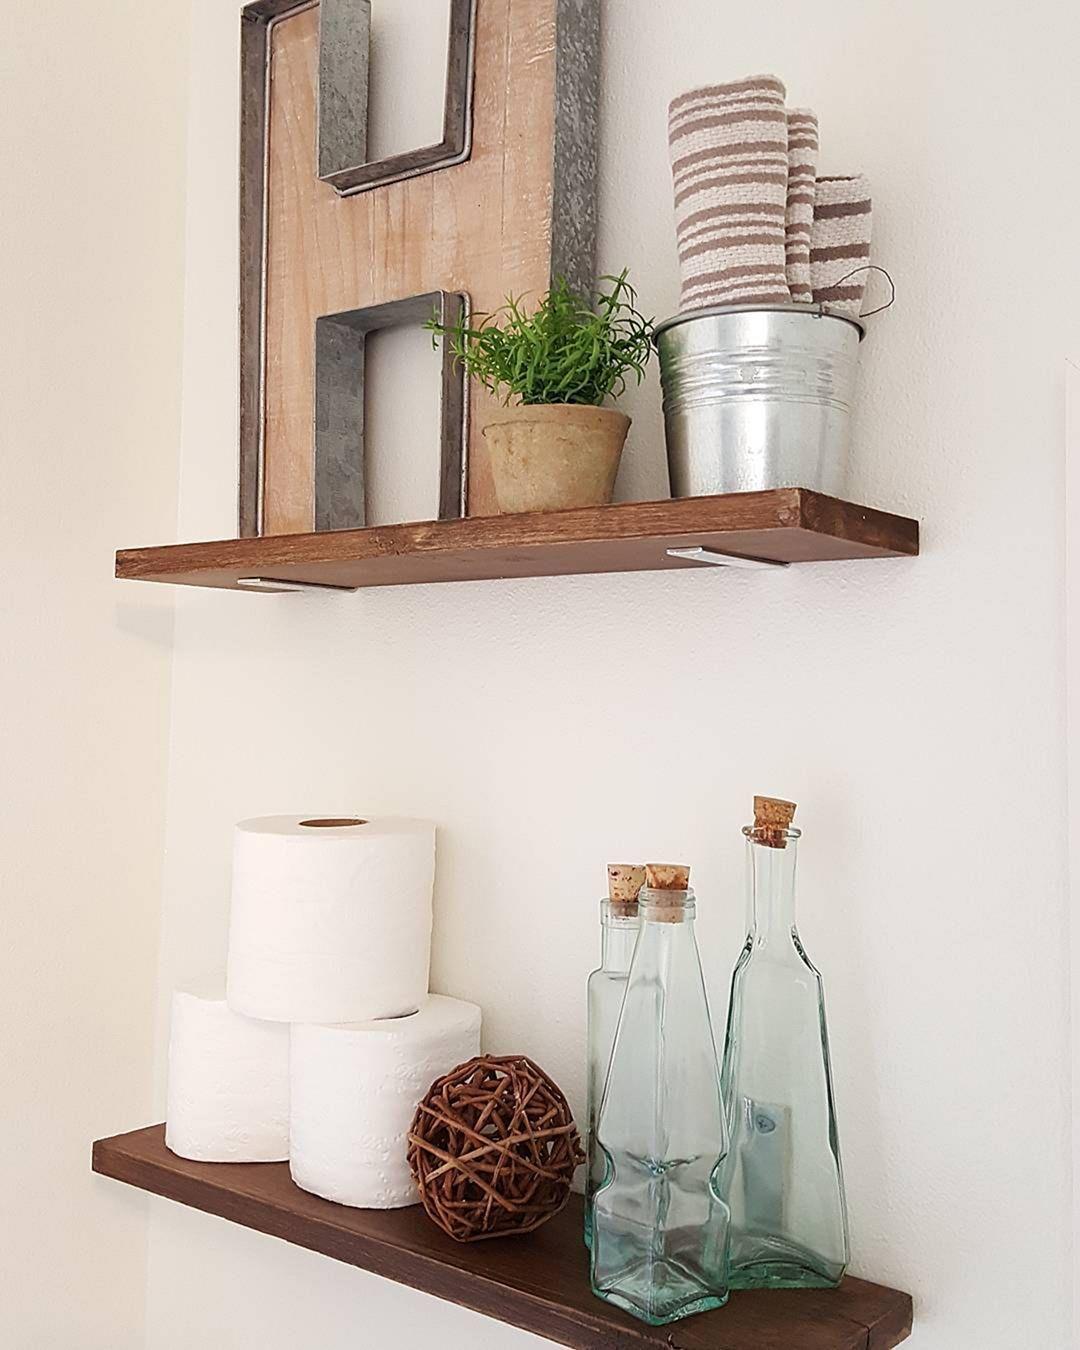 25 Amazing DIY Floating Shelves For Bathroom to Easy